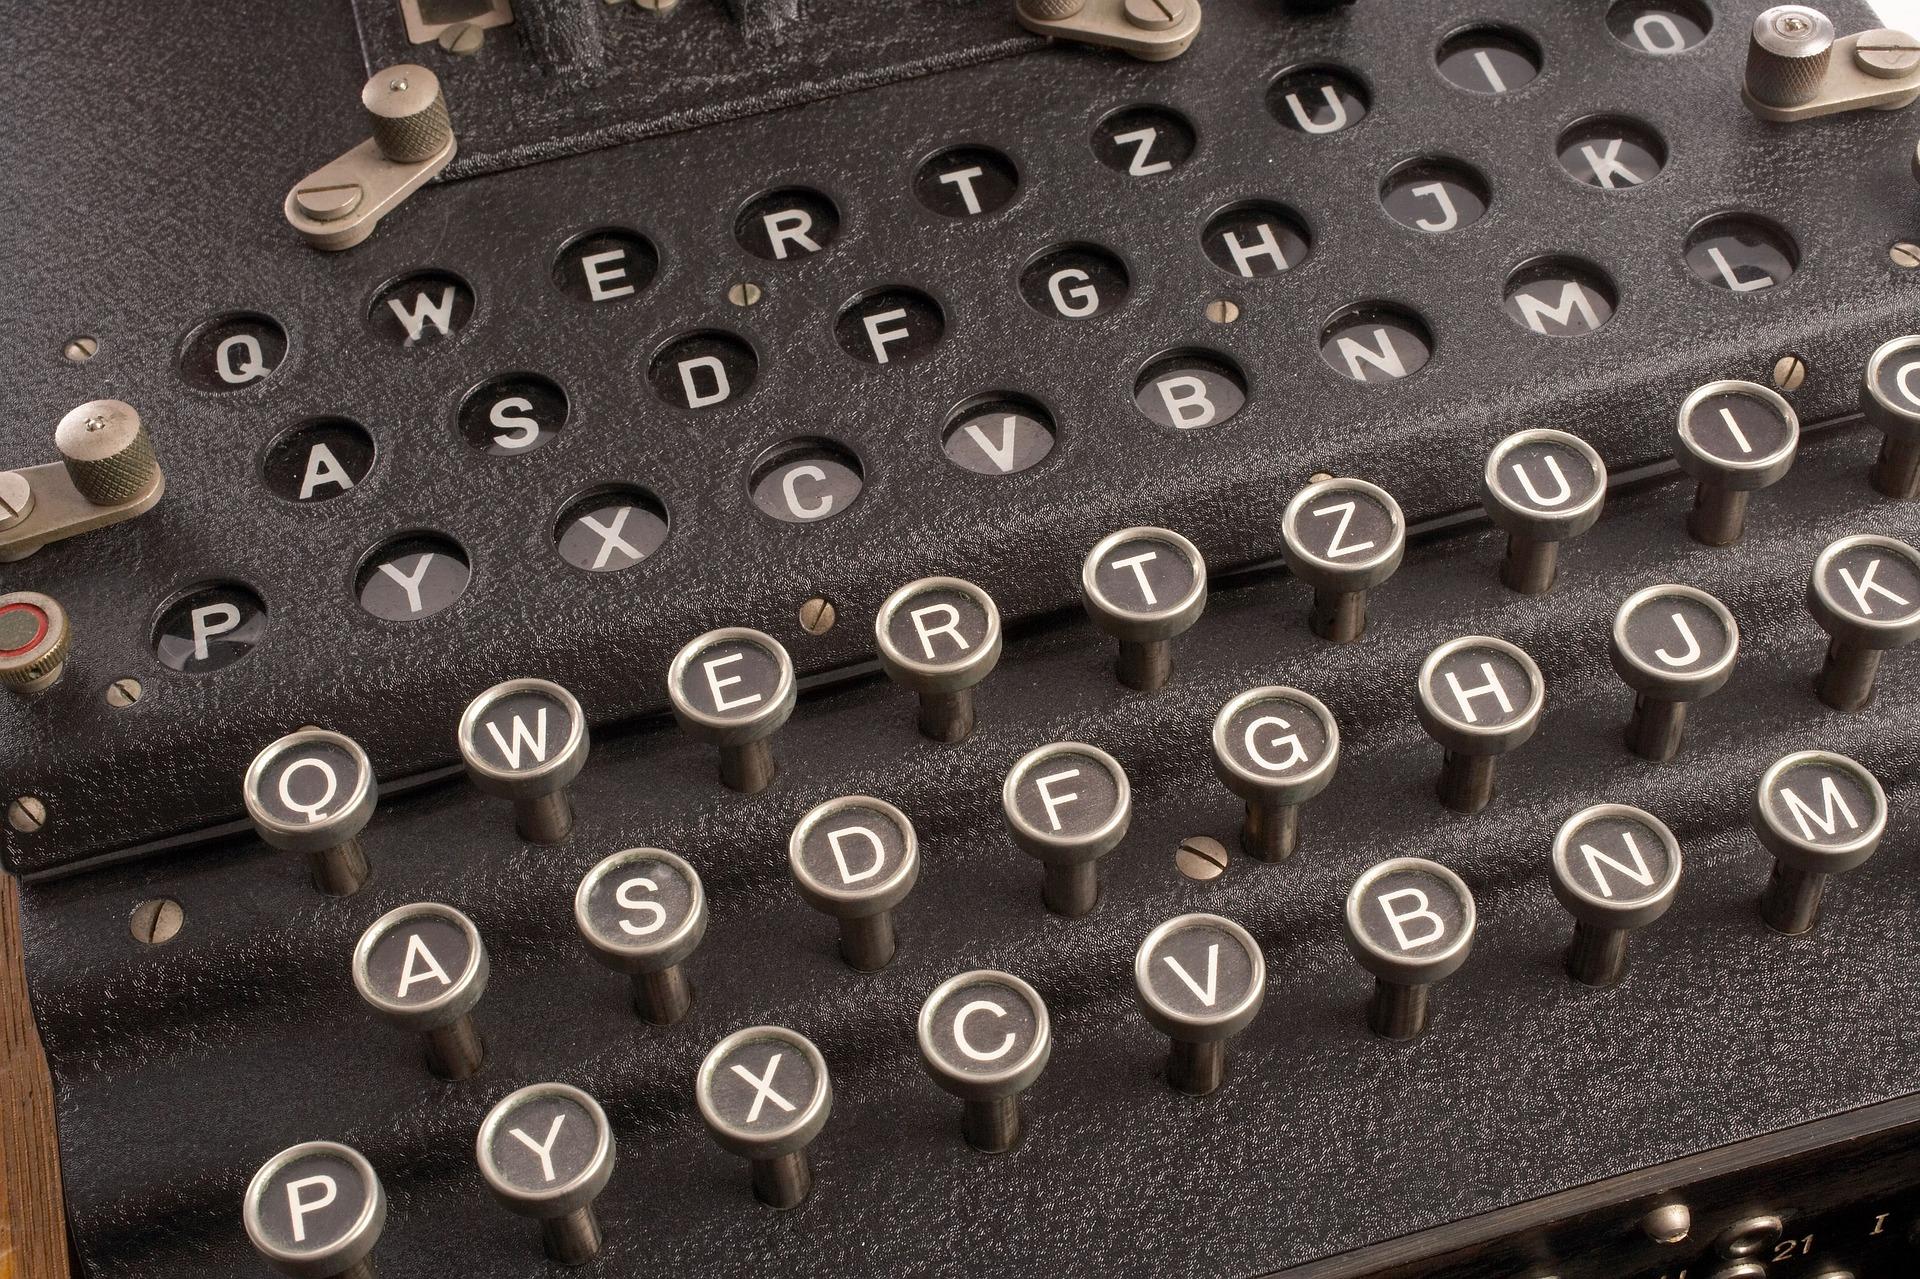 rotor-cipher-machine-1147801_1920.jpg